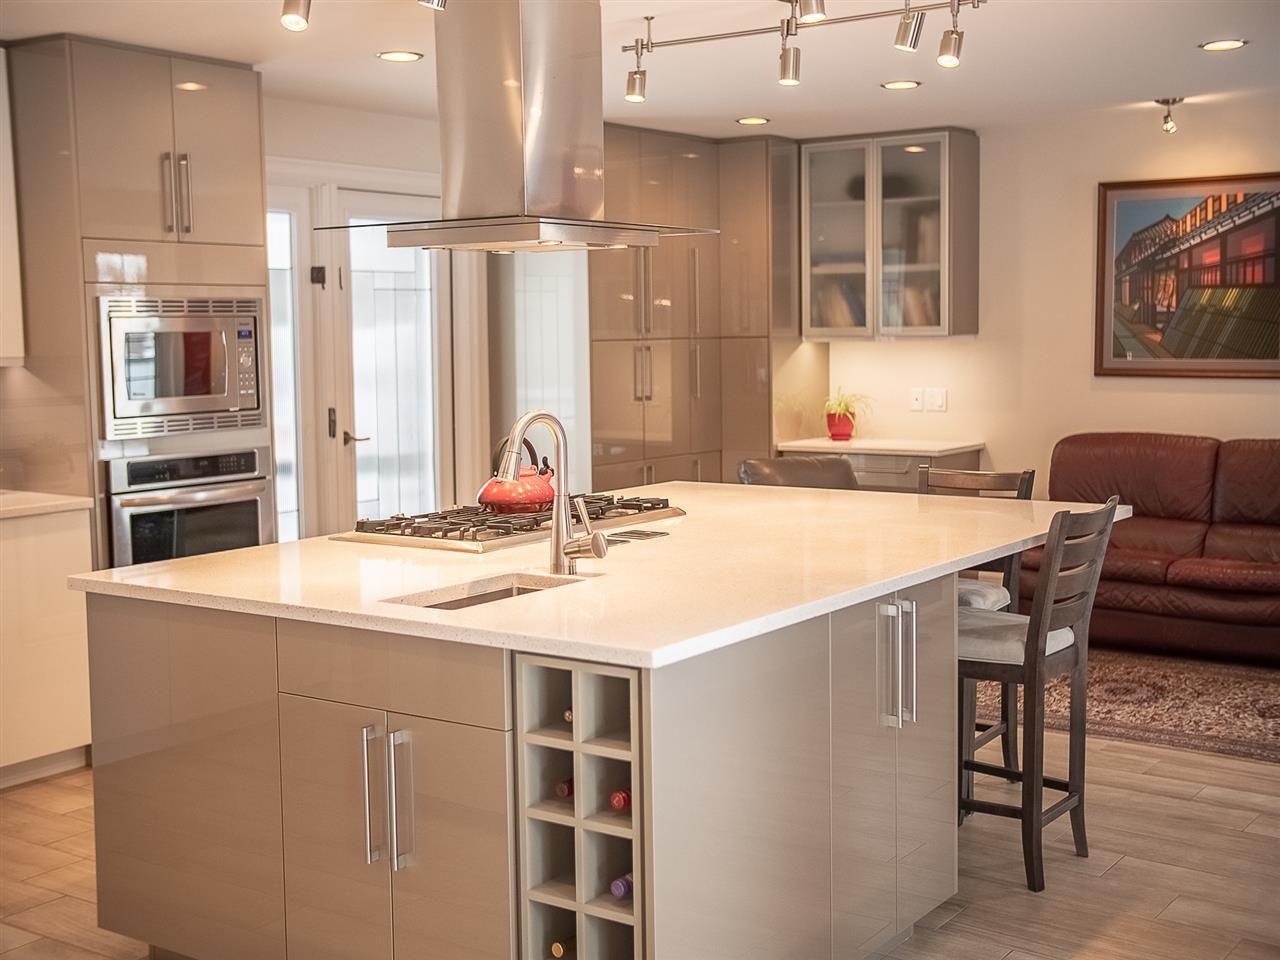 Main Photo: 5304 141 Street in Edmonton: Zone 14 House for sale : MLS®# E4141799